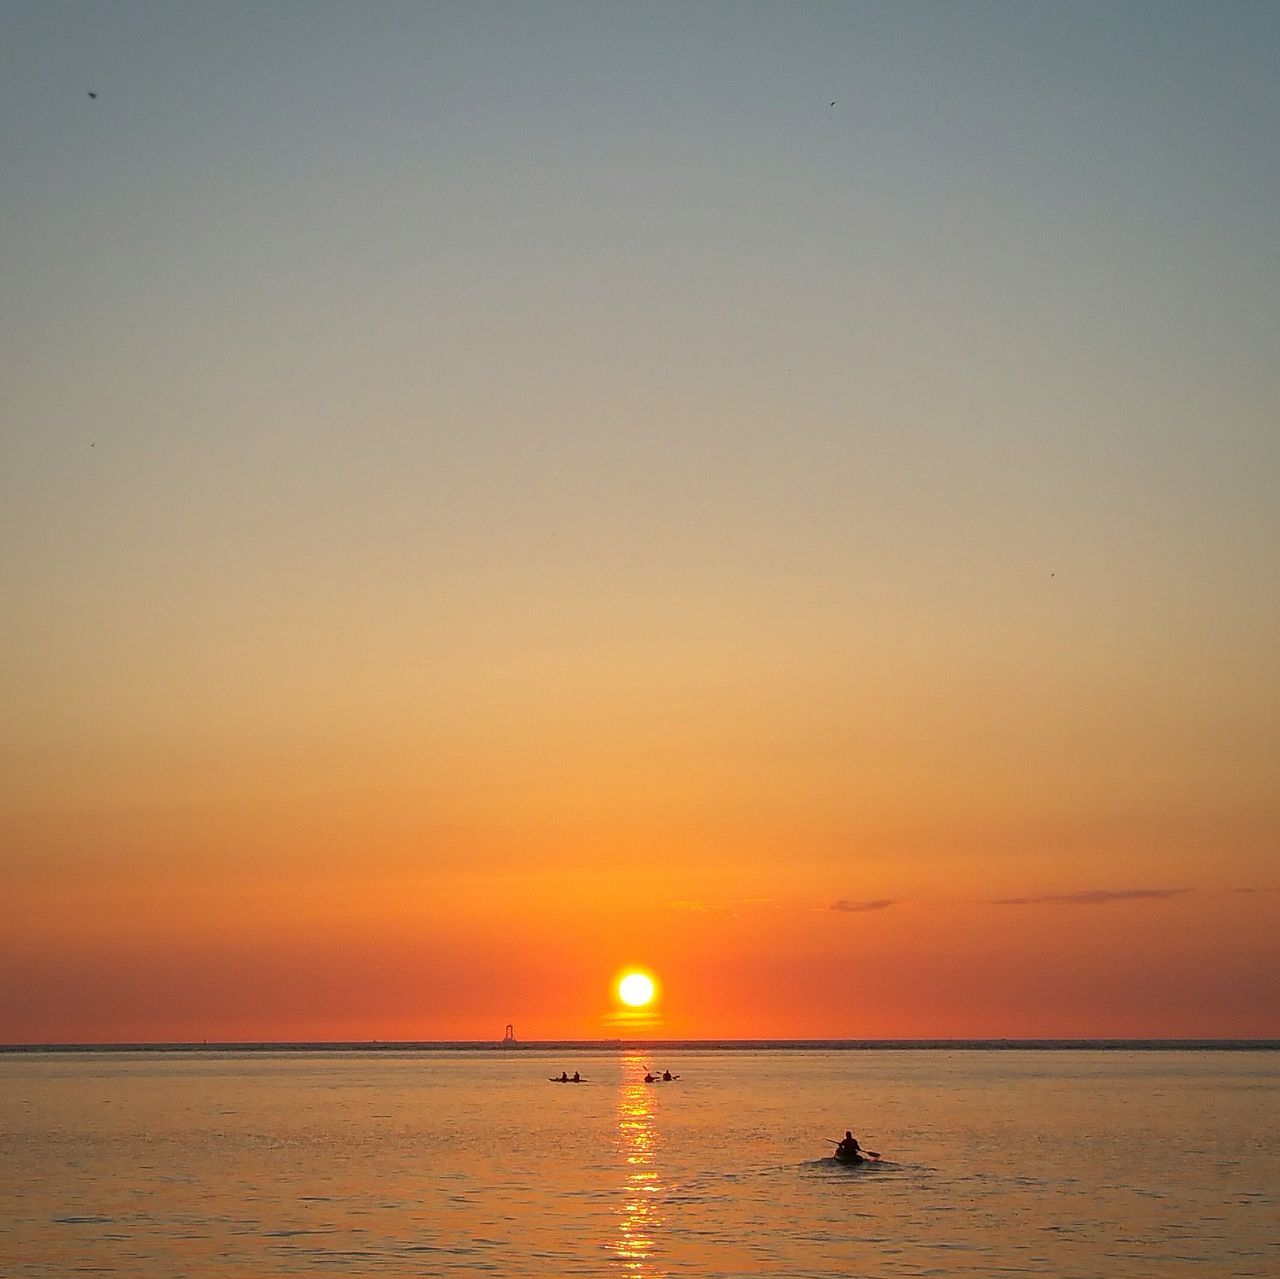 Row into the Sunset at Hoylake, Wirral High Tide Wirral Peninsula Uk Coastline English Coastline Sunsetandwater Canoe Canoeing Photography Colour Of Life